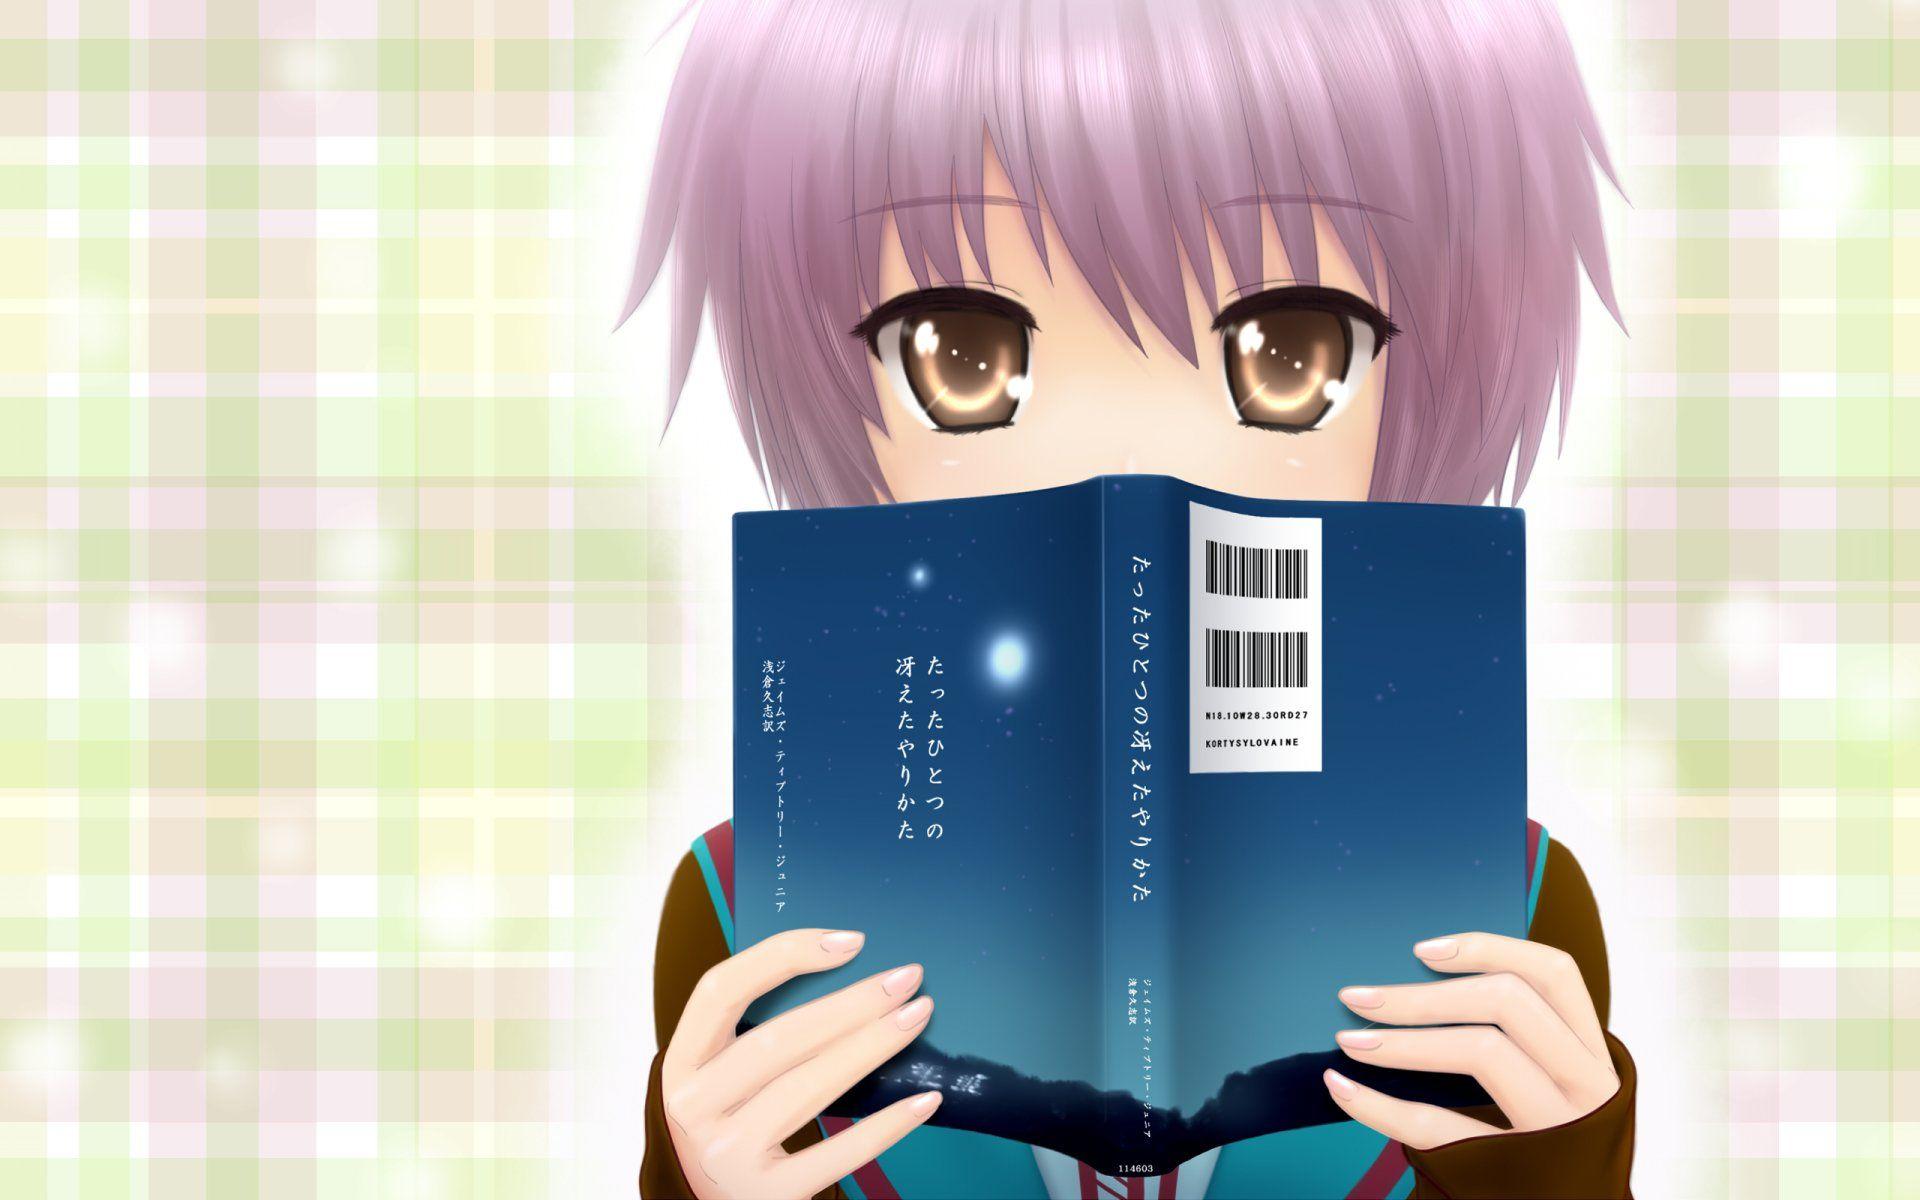 Anime The Melancholy Of Haruhi Suzumiya Yuki Nagato Wallpaper